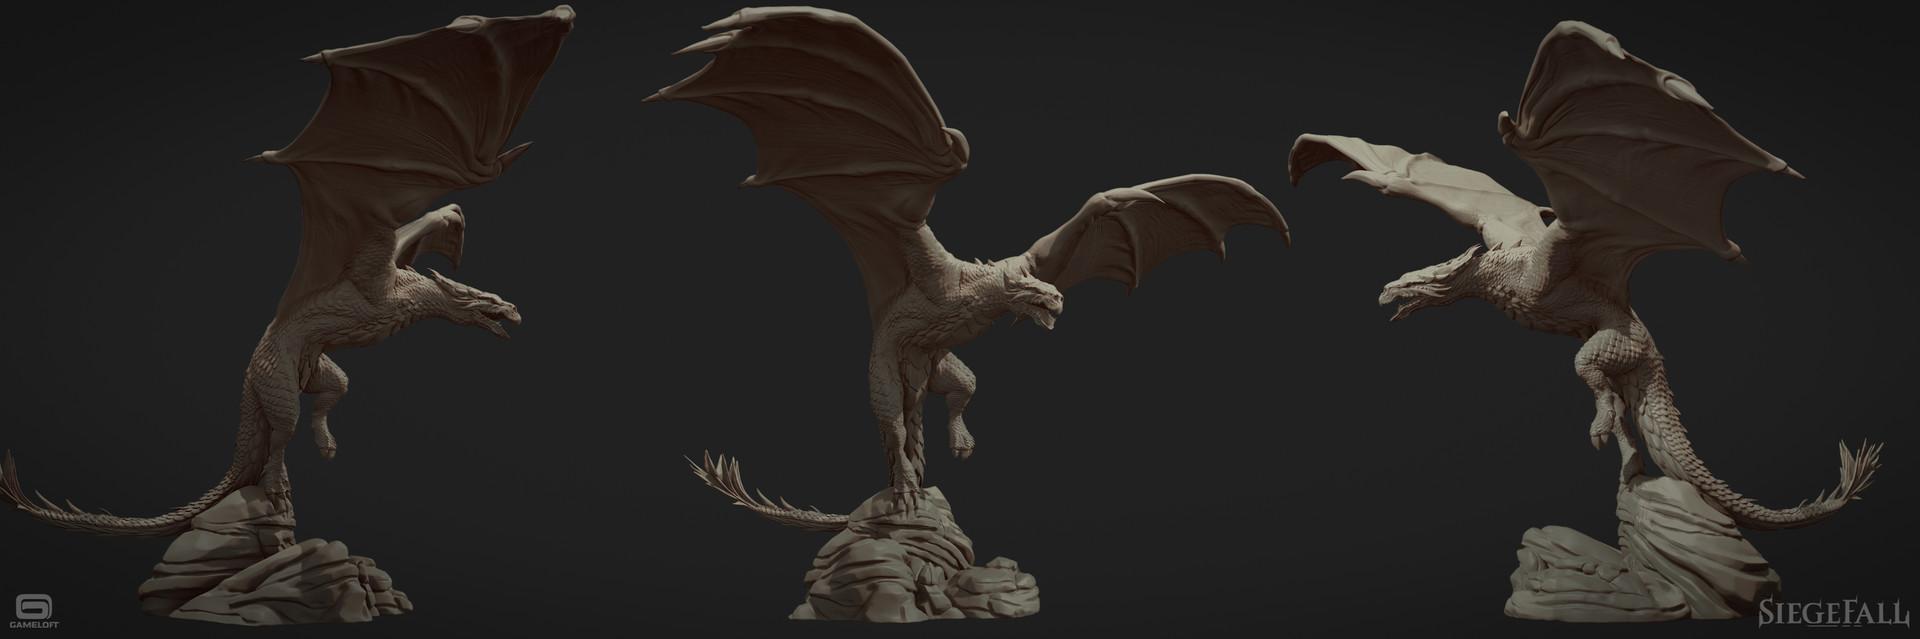 Siegefall - dragon